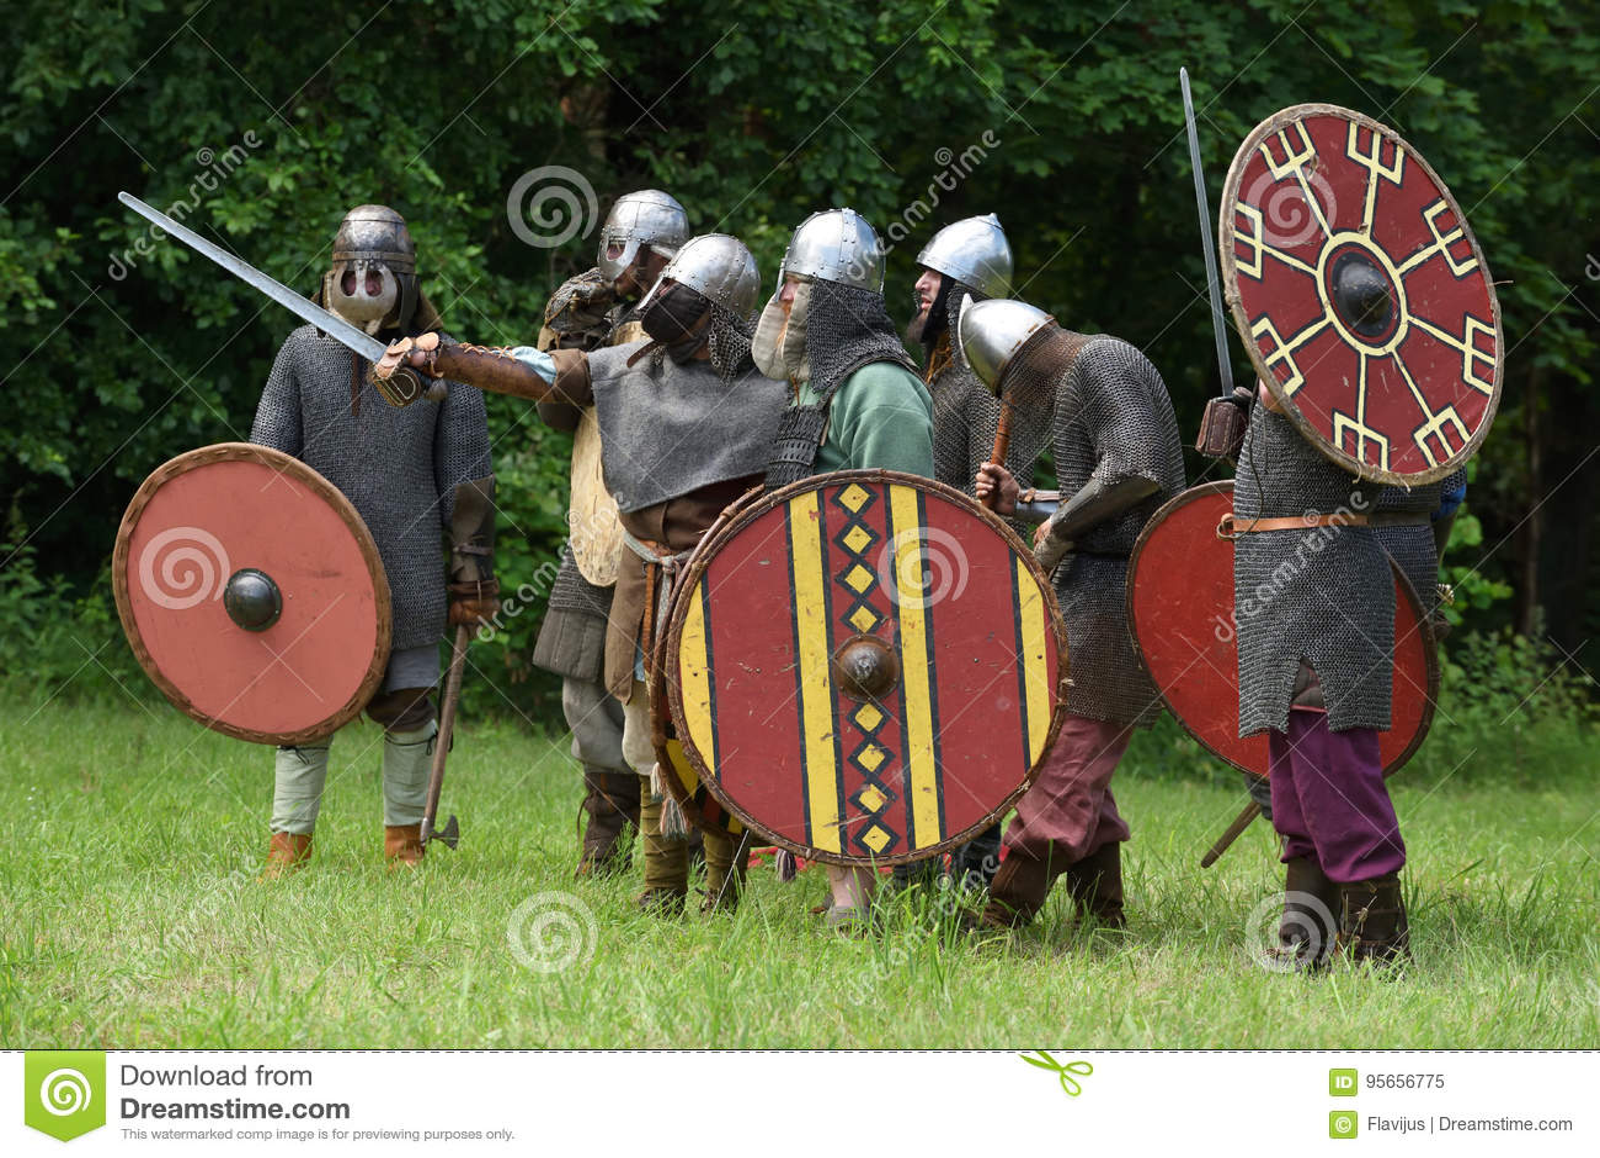 Festival medieval das lutas